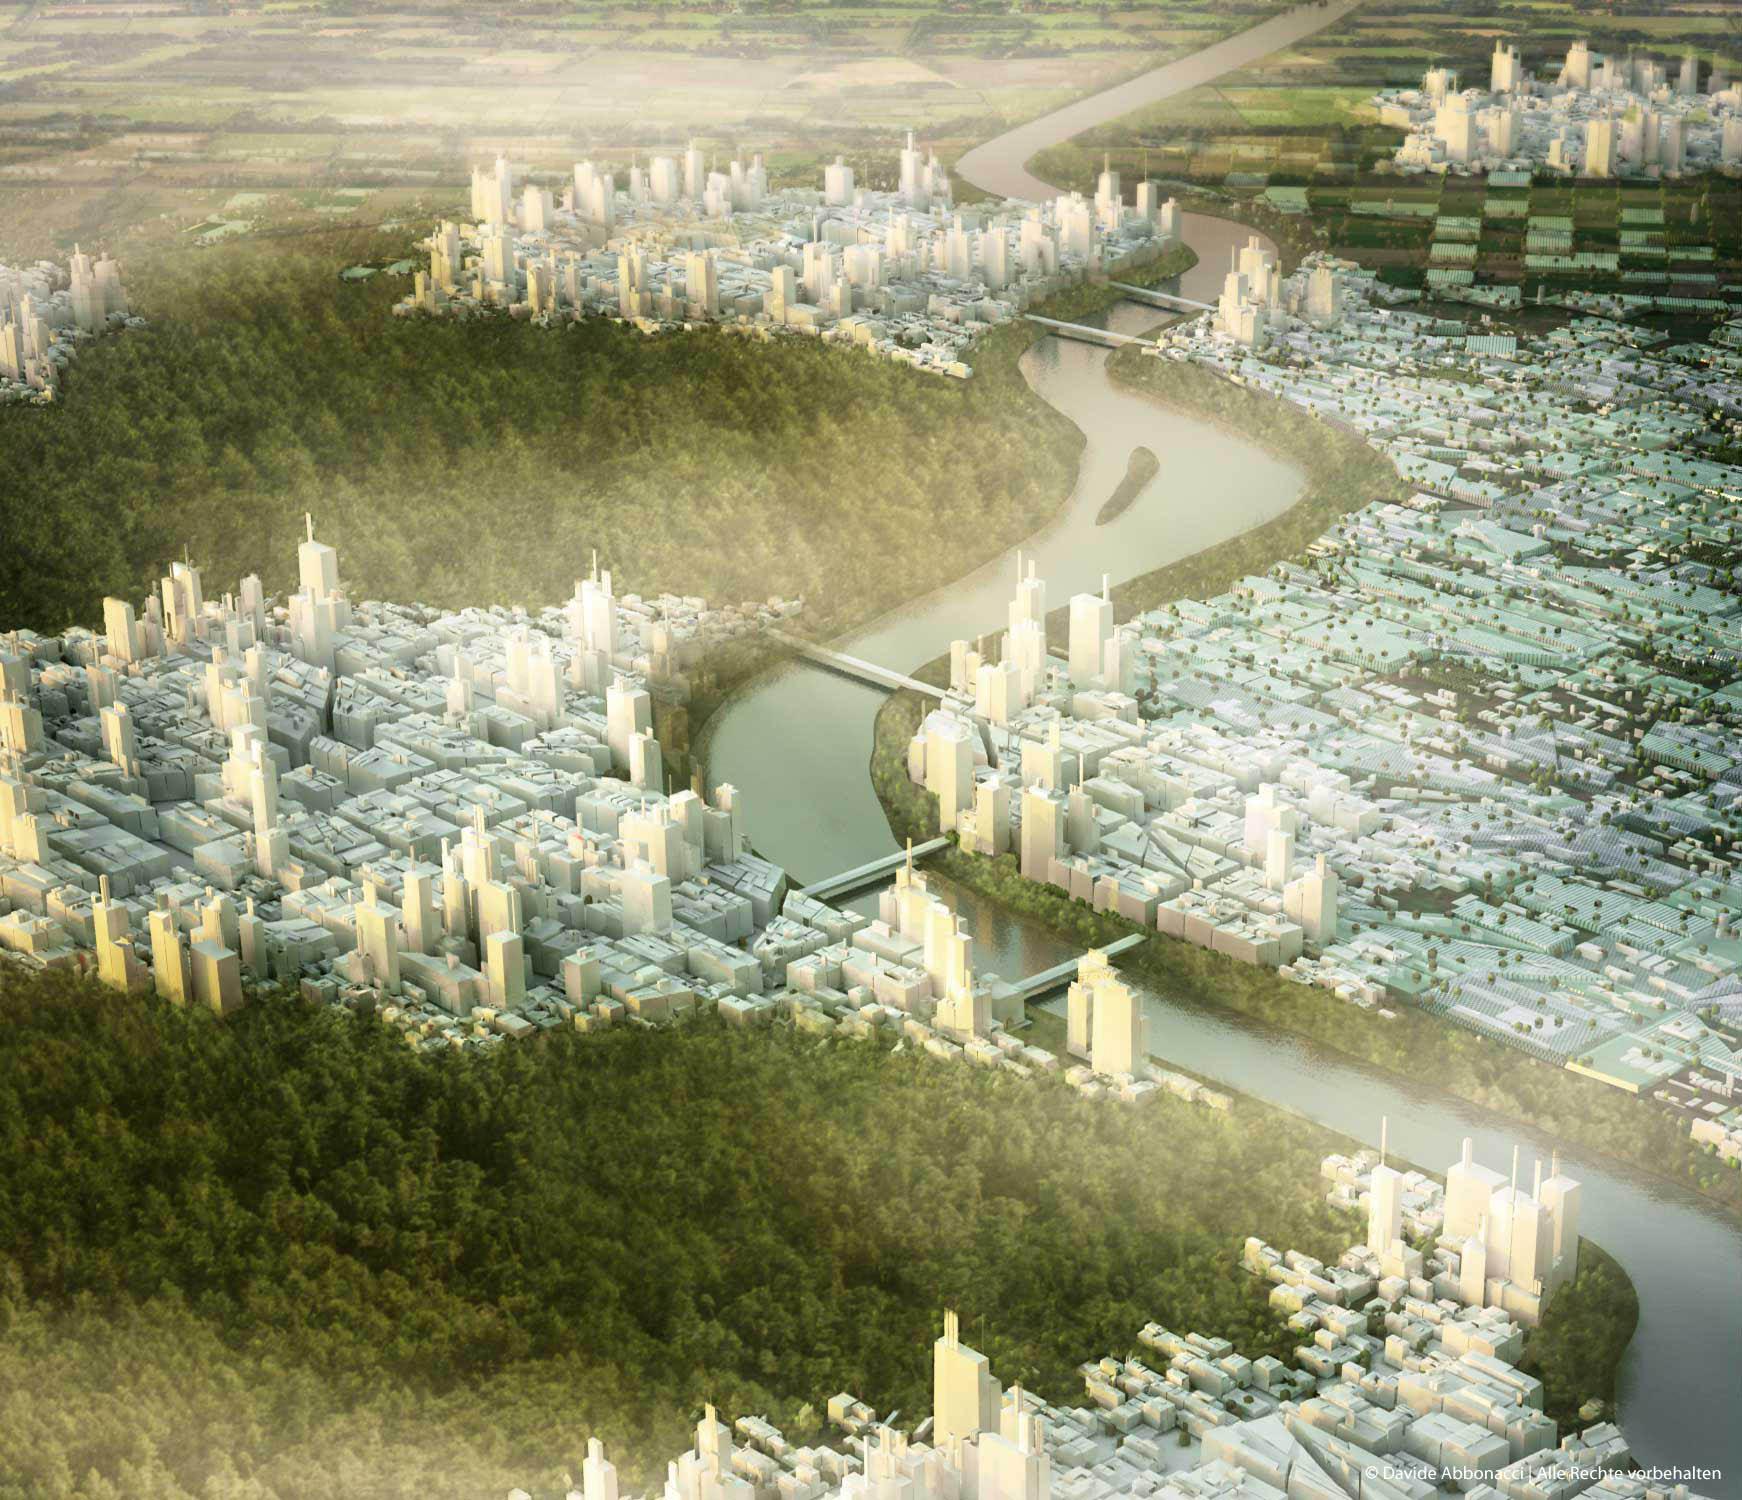 Grand Paris - Métropole Douce - Propositions for the Post-Kyoto Metropolis   LIN Architects Urbanists   2009 Masterplan - Studie